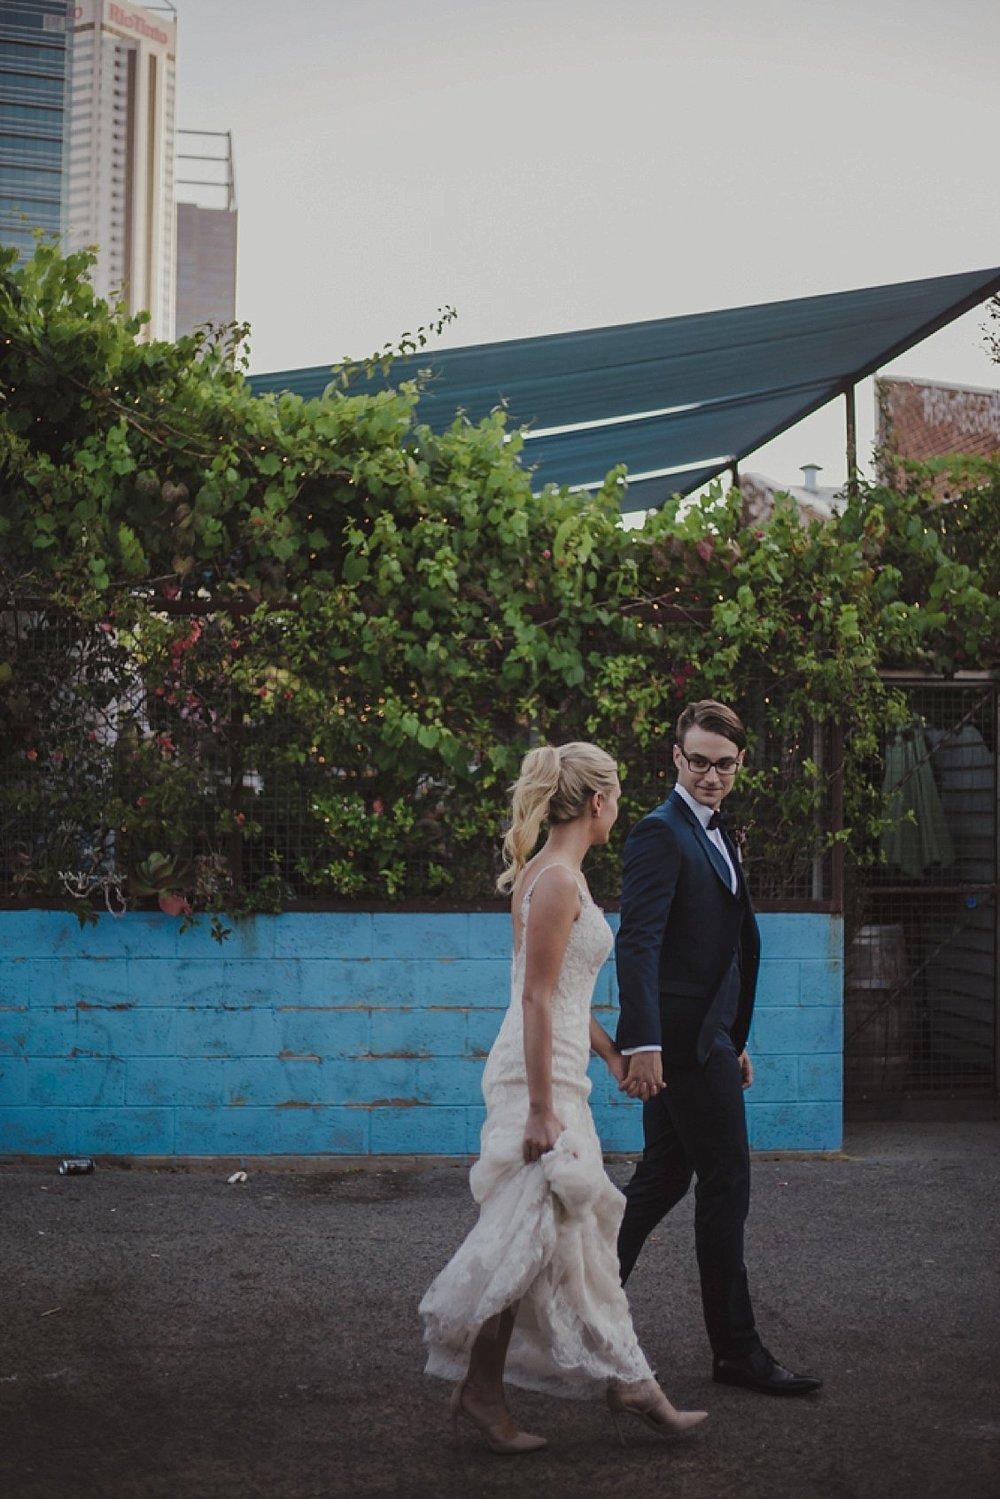 perth-wedding-photographer-art-gallery-industrial_0031.jpg